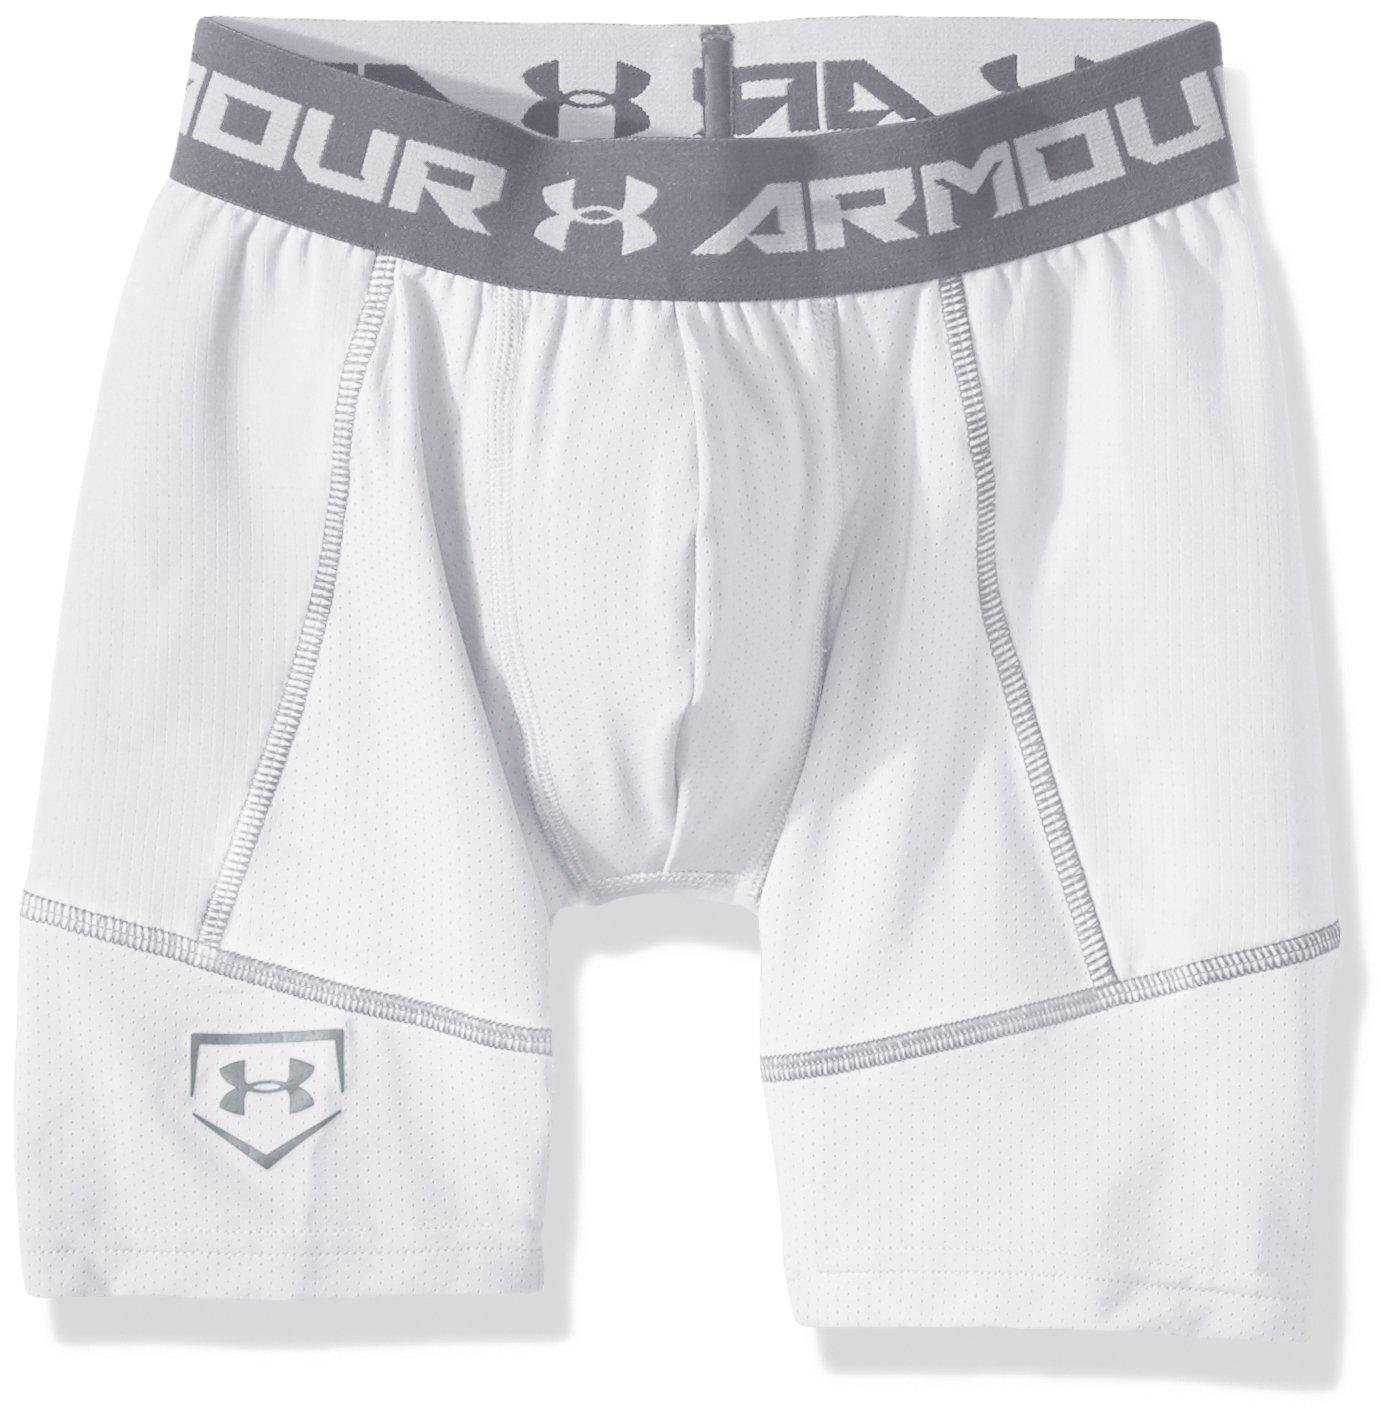 Under Armour Boys 'スライダソリッド B01M6Z90GG Youth Medium|White/Baseball Gray White/Baseball Gray Youth Medium